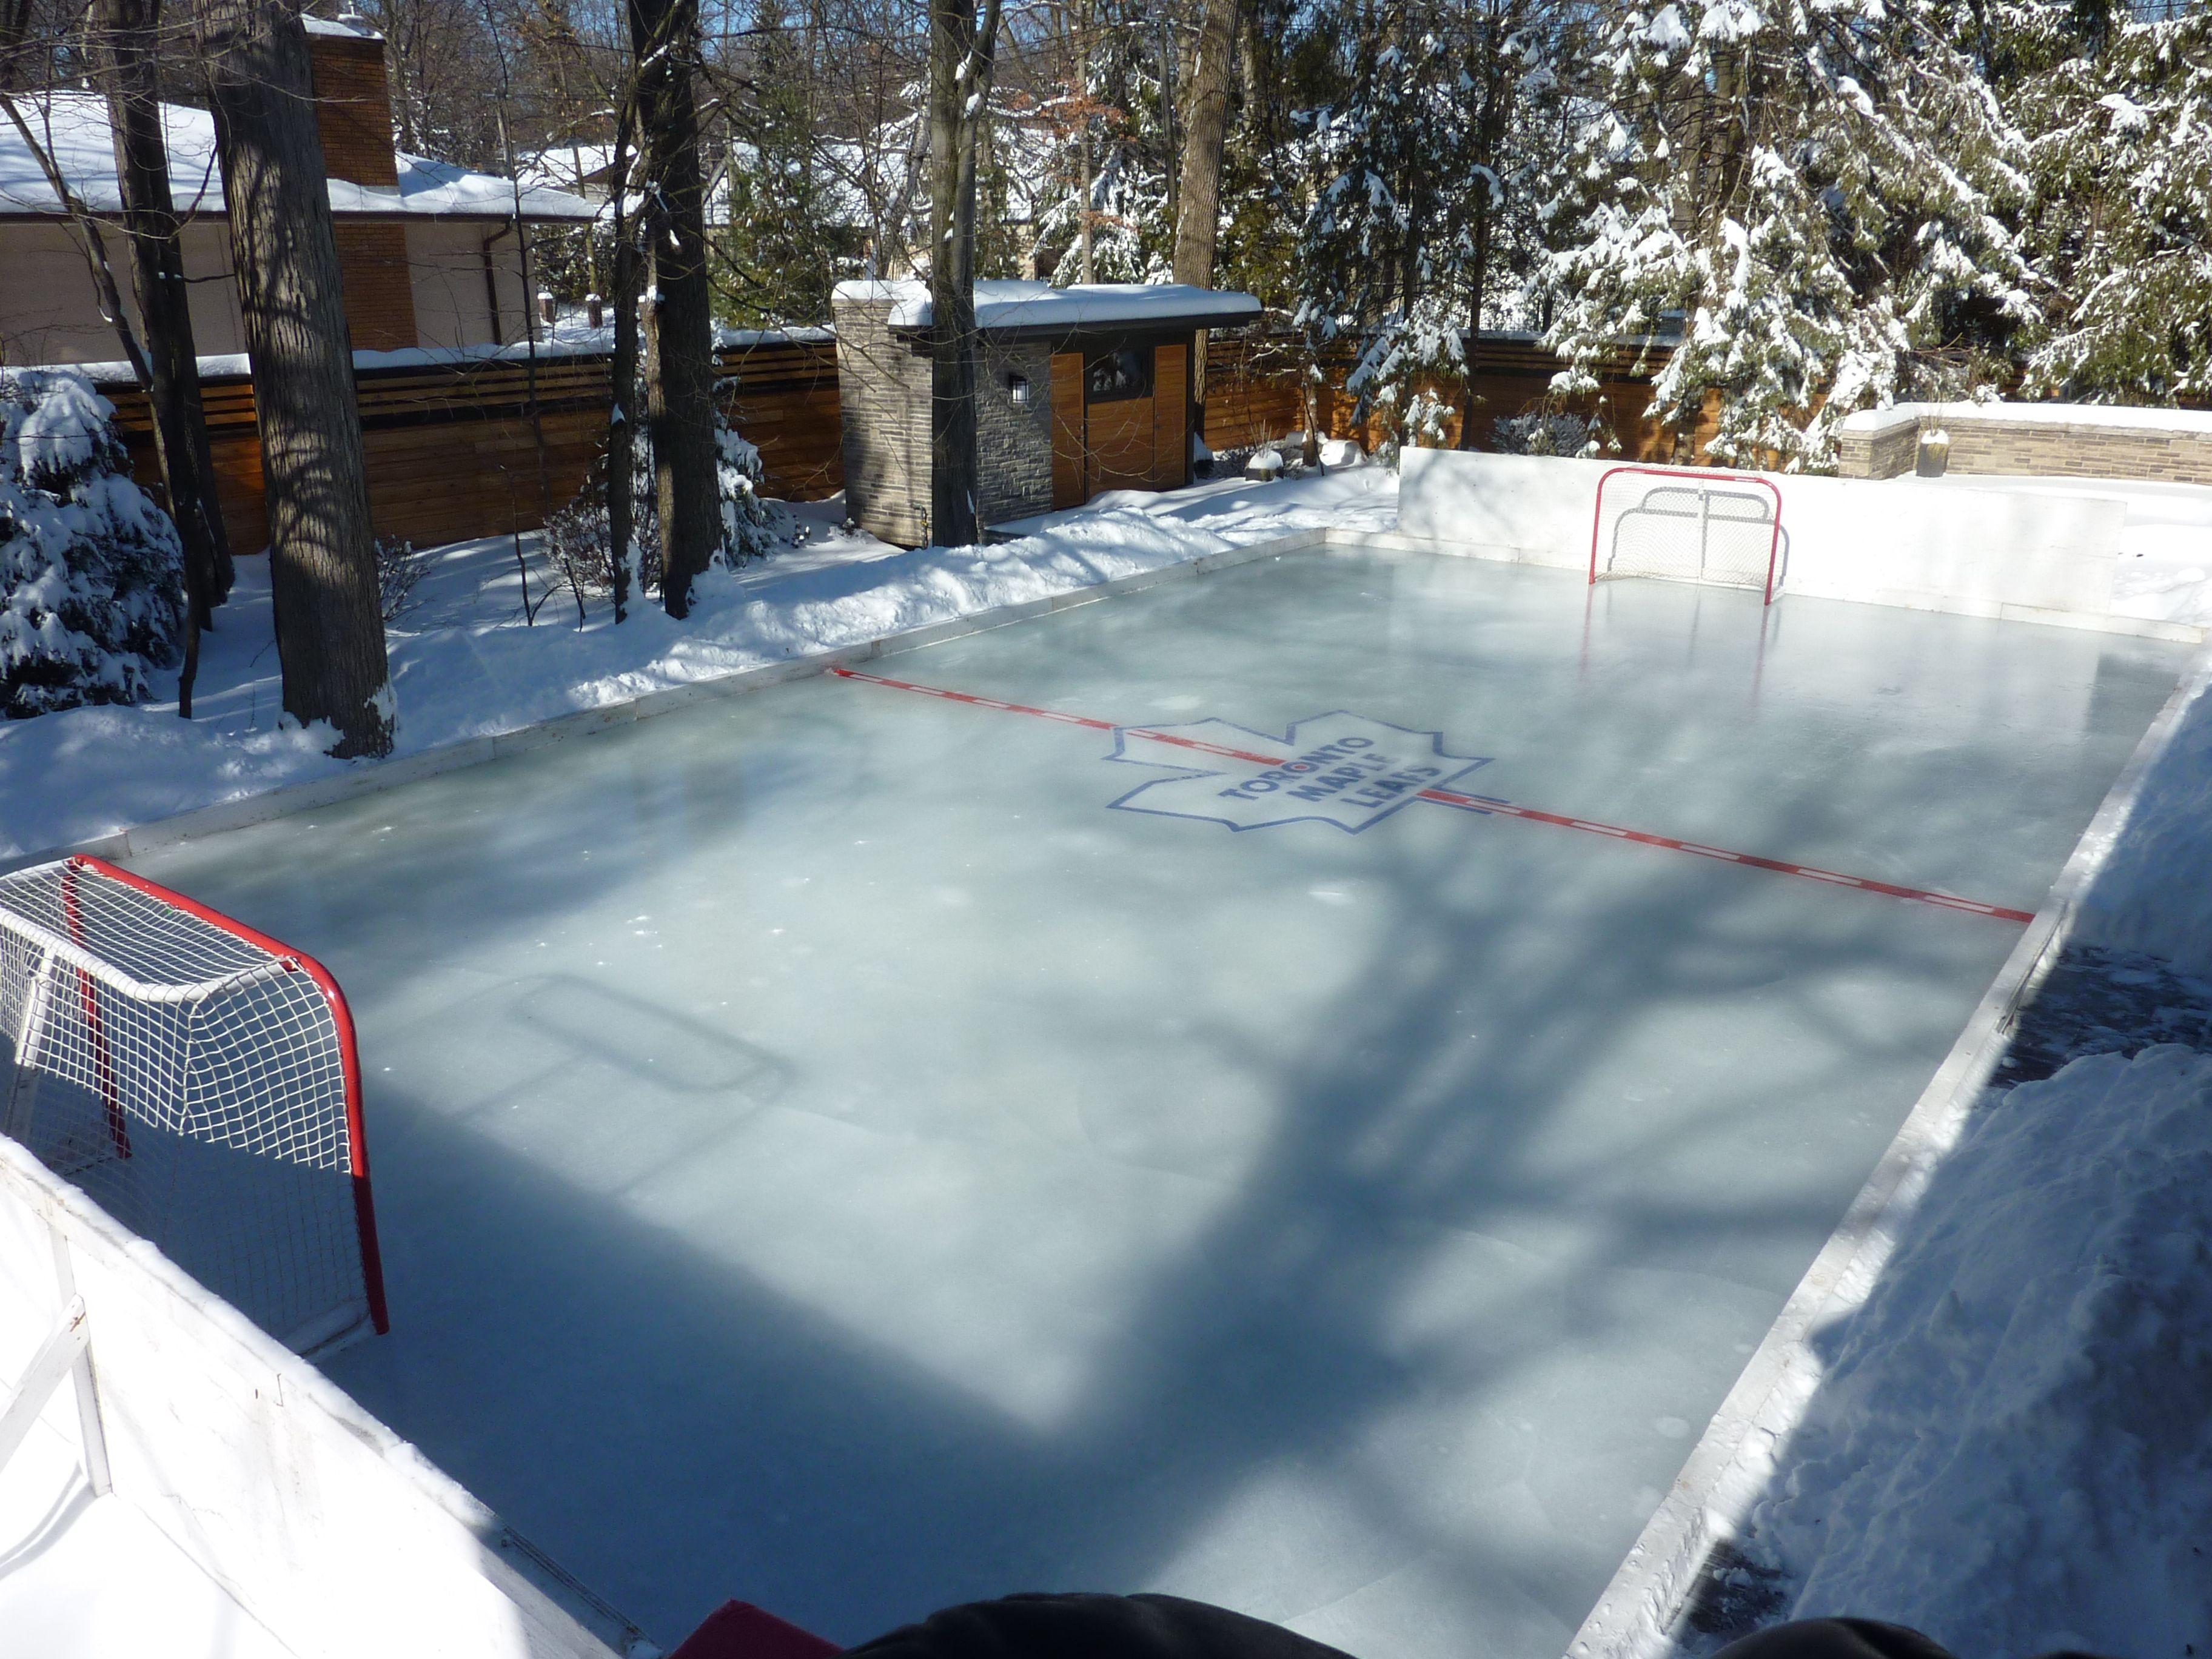 David S Backyard Skating Rink Goleafsgo Tml Backyard Rink Backyard Ice Rink Ice Hockey Rink Hockey Mom Backyard hockey rink kit